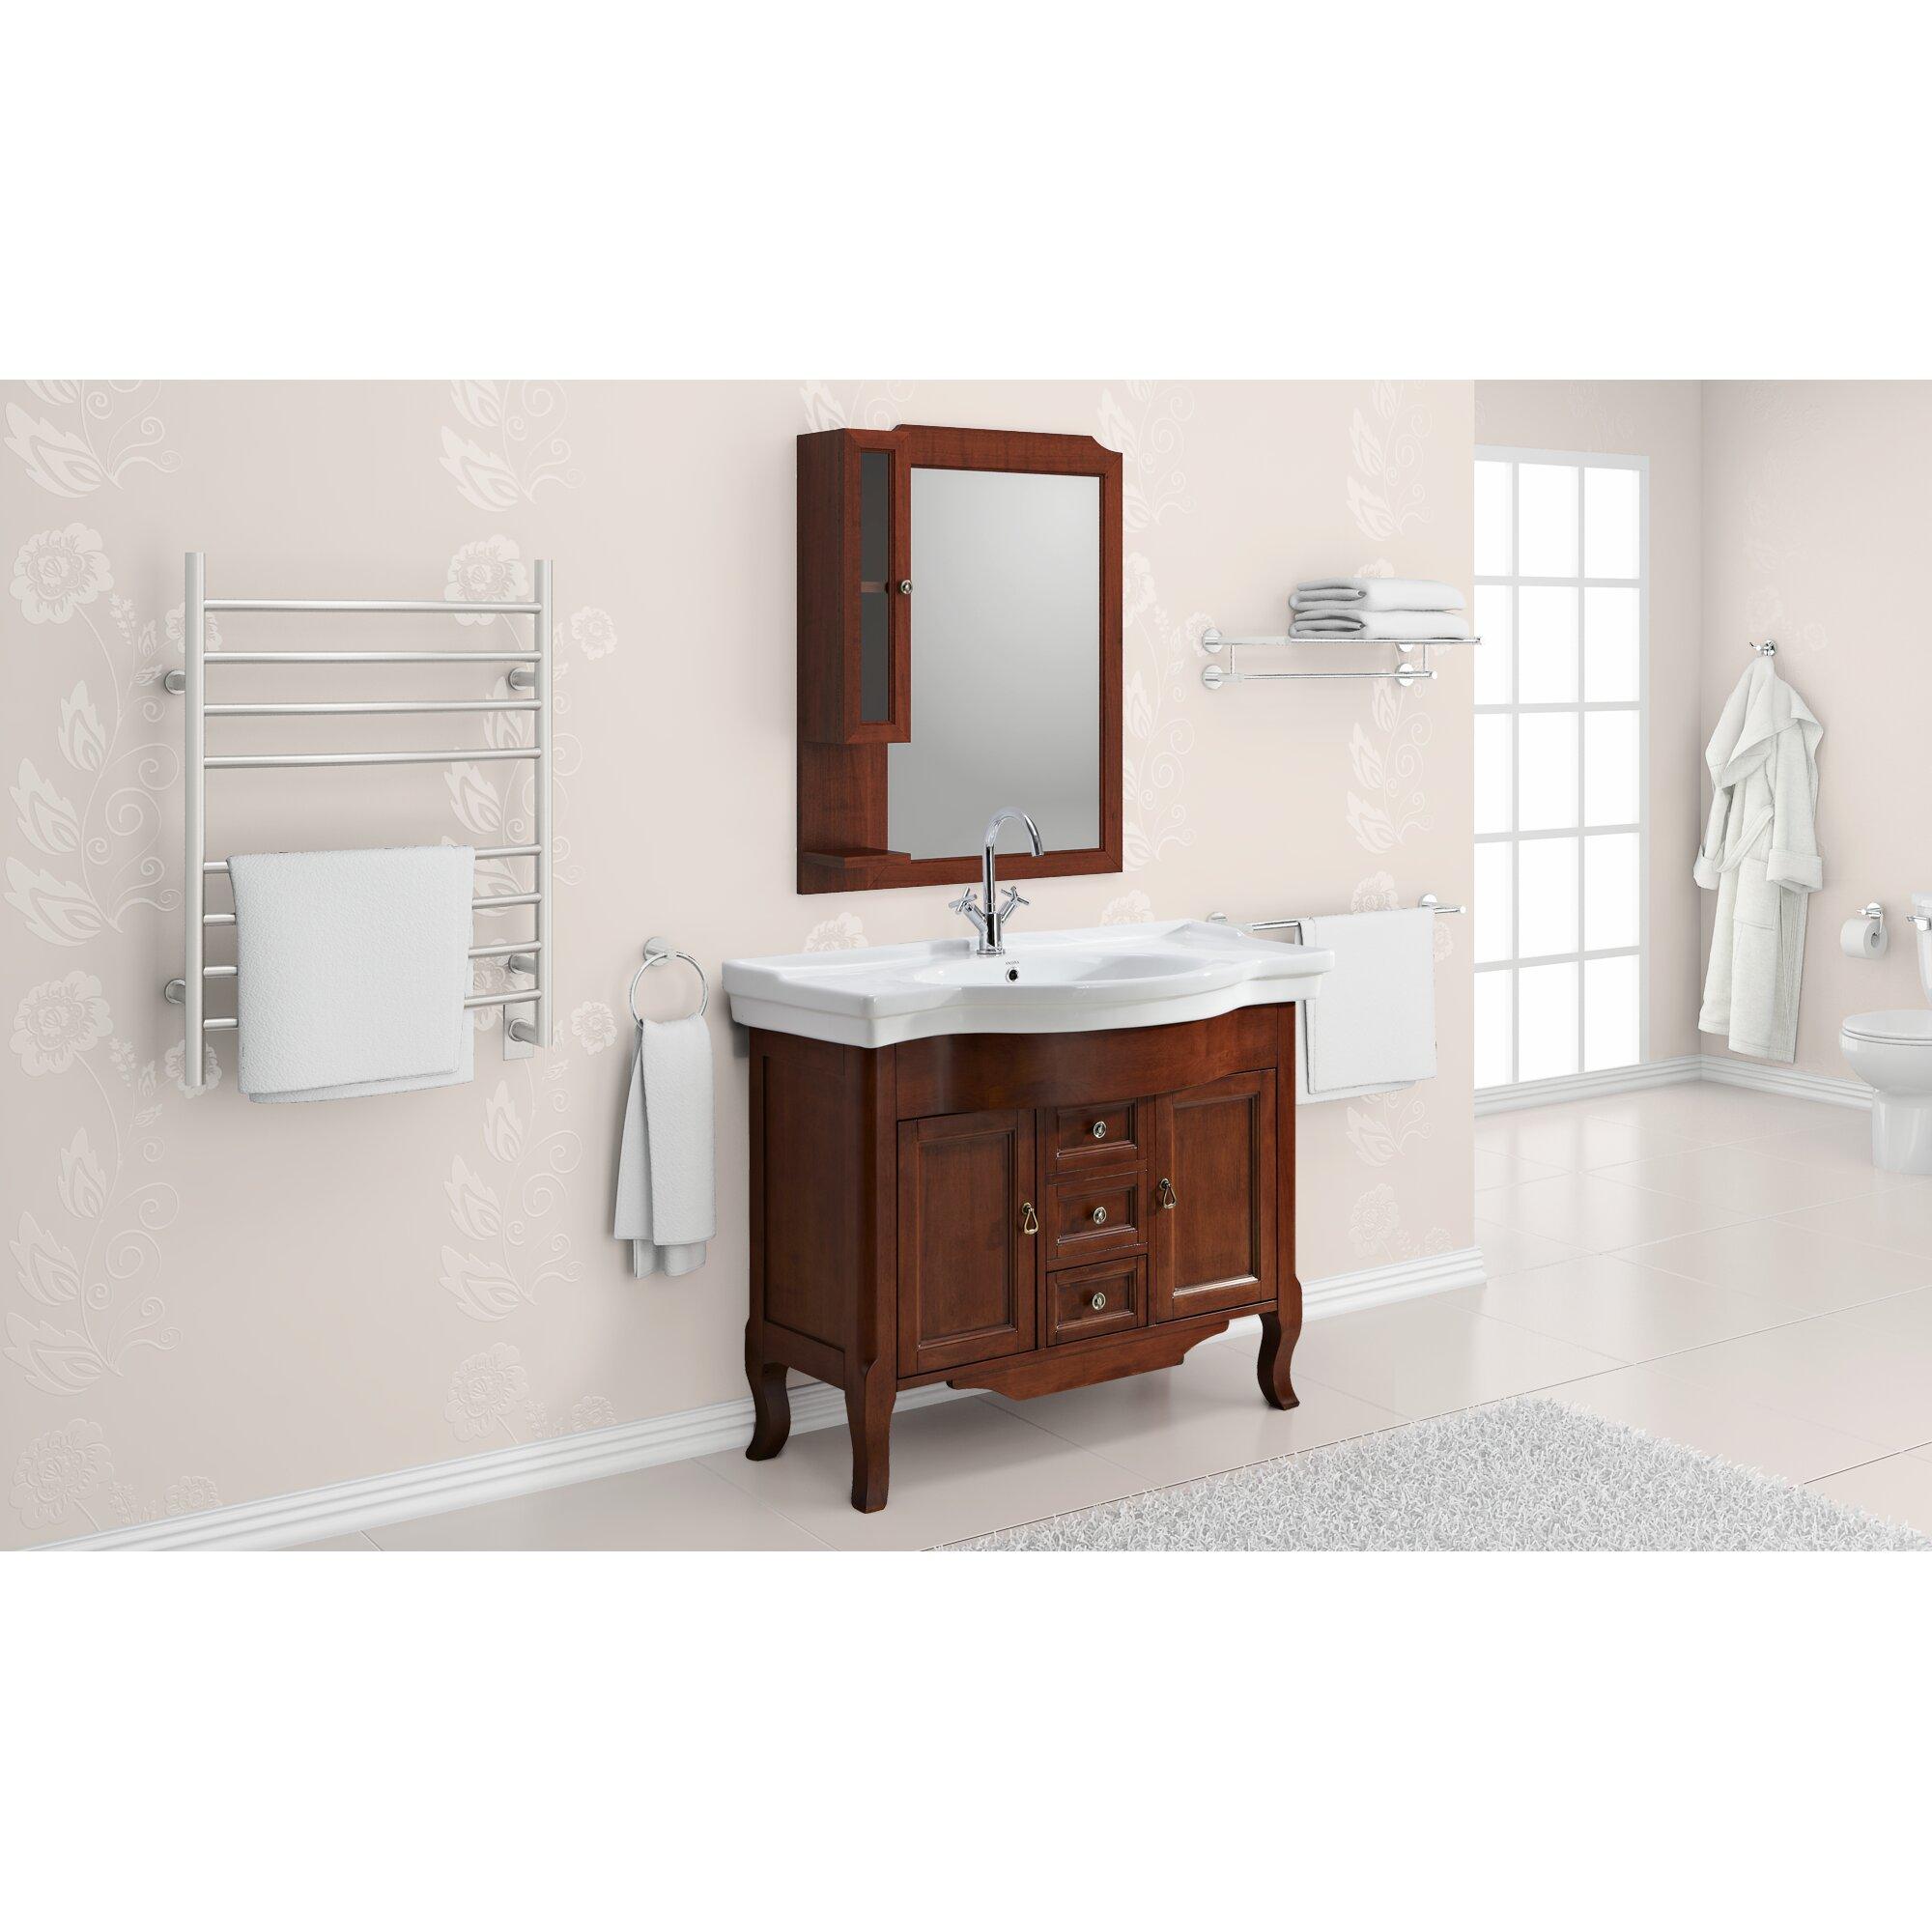 Ancona 4 piece bathroom hardware set reviews wayfair for Bathroom 4 piece set